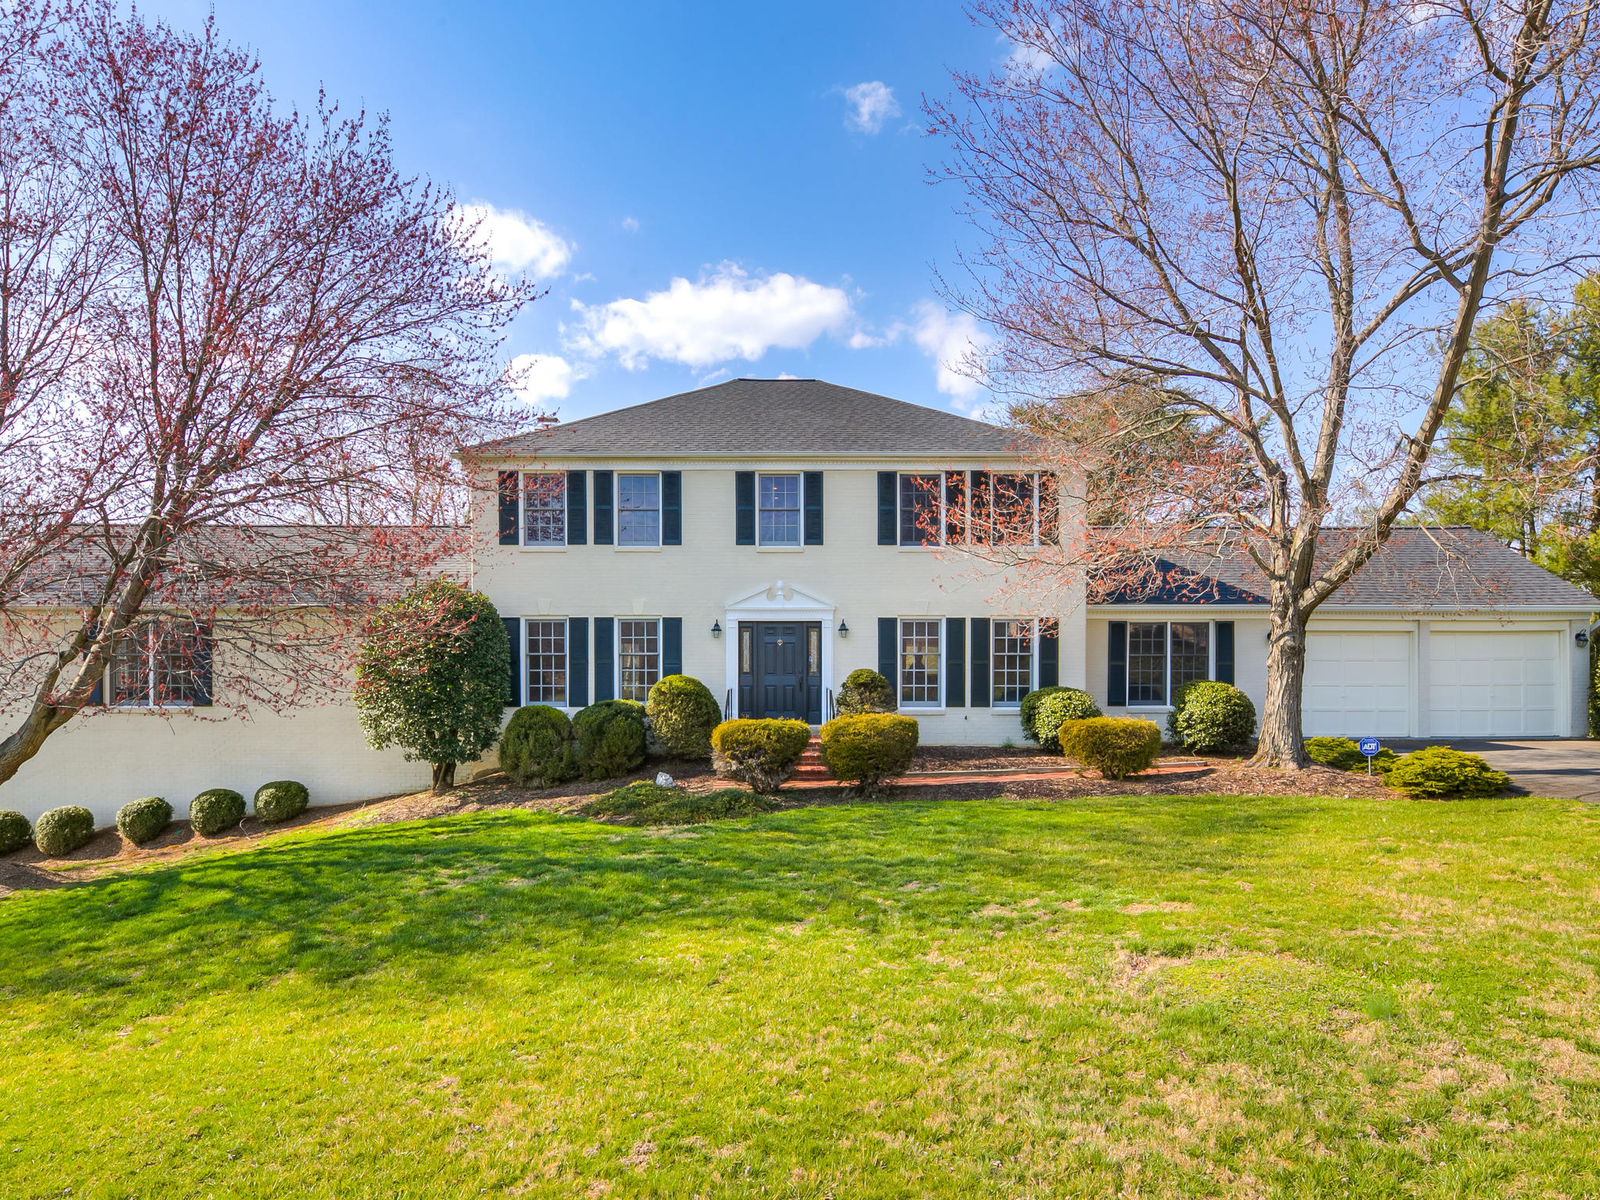 Single Family Home for Sale at Hickory Creek 800 Follin Farm Ln Great Falls, Virginia, 22066 United States